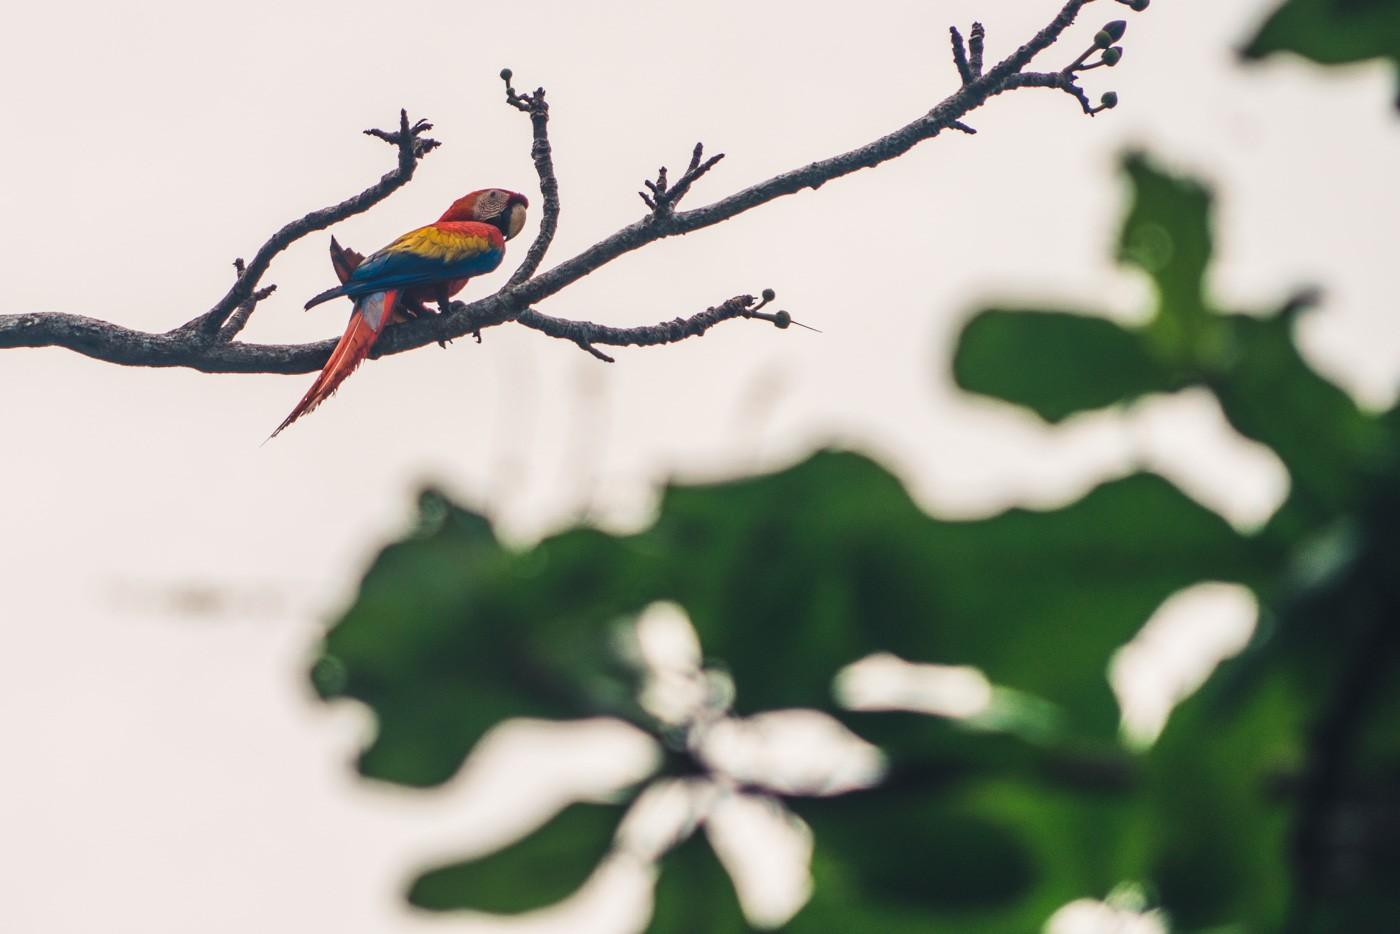 Puerto Jimenez Costa Rica: Visit Corcovado National Park